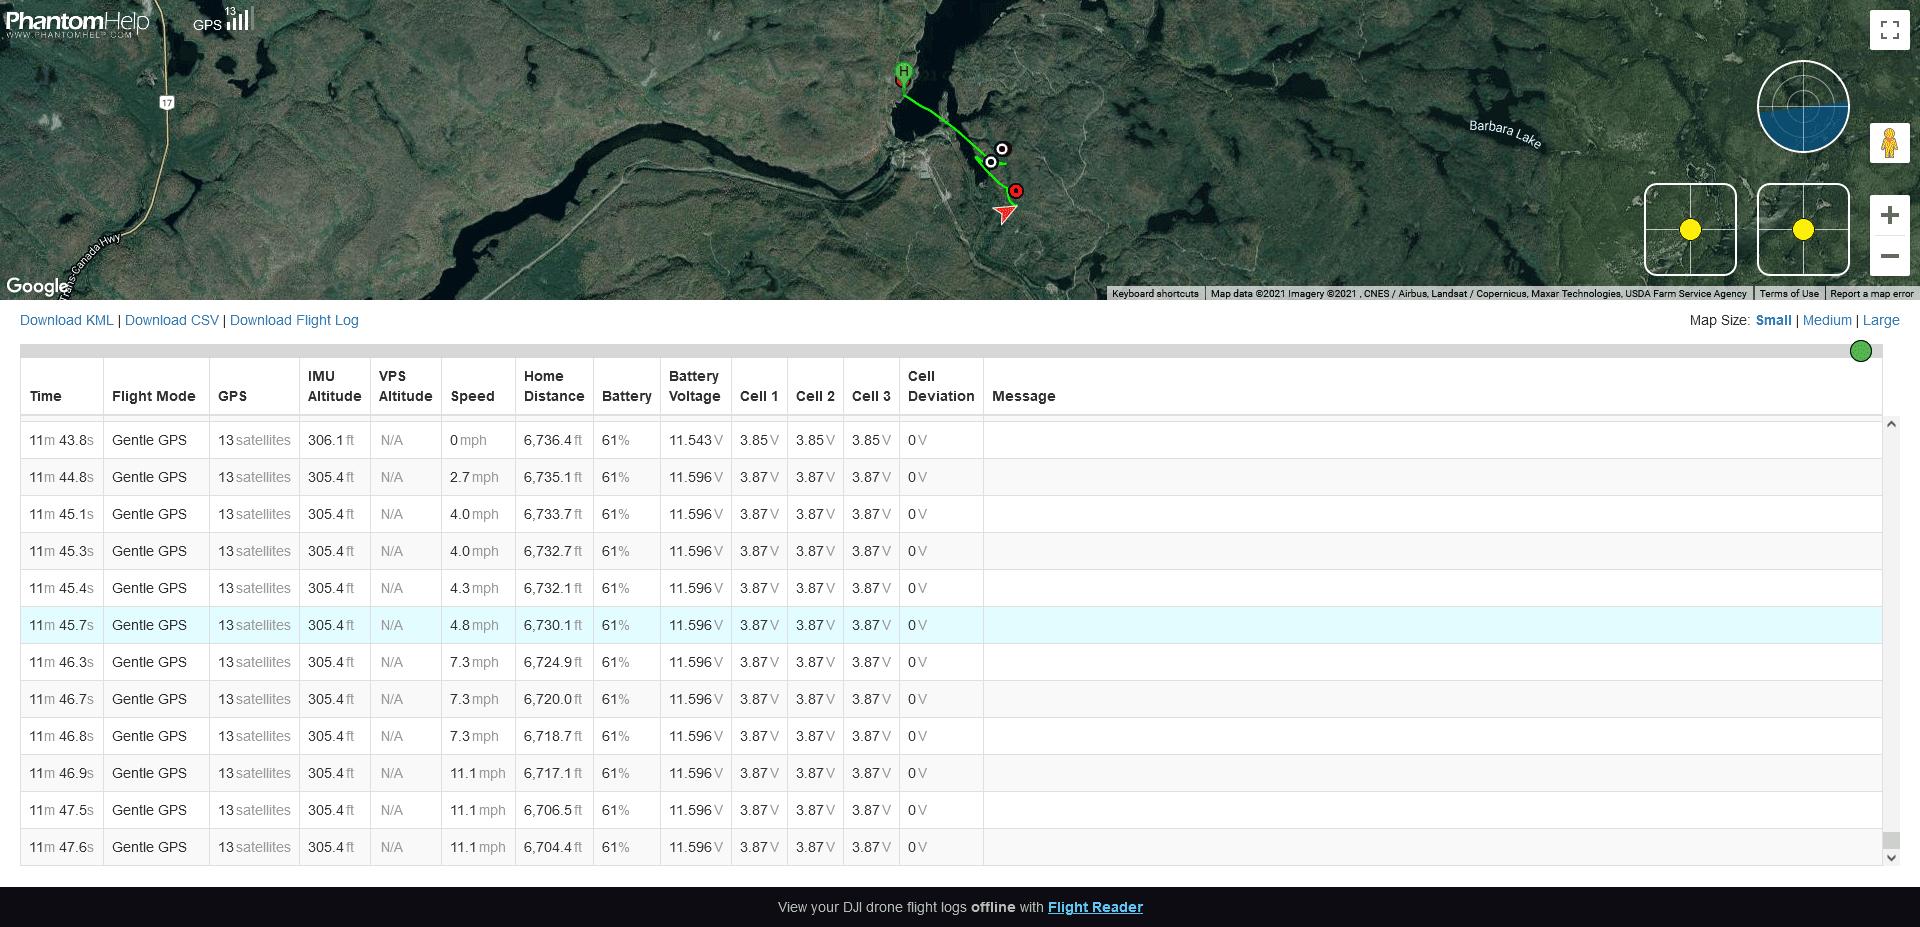 Screenshot-2021-07-15-at-14-47-51-DJI-Flight-Log-Viewer---PhantomHelp-com.png